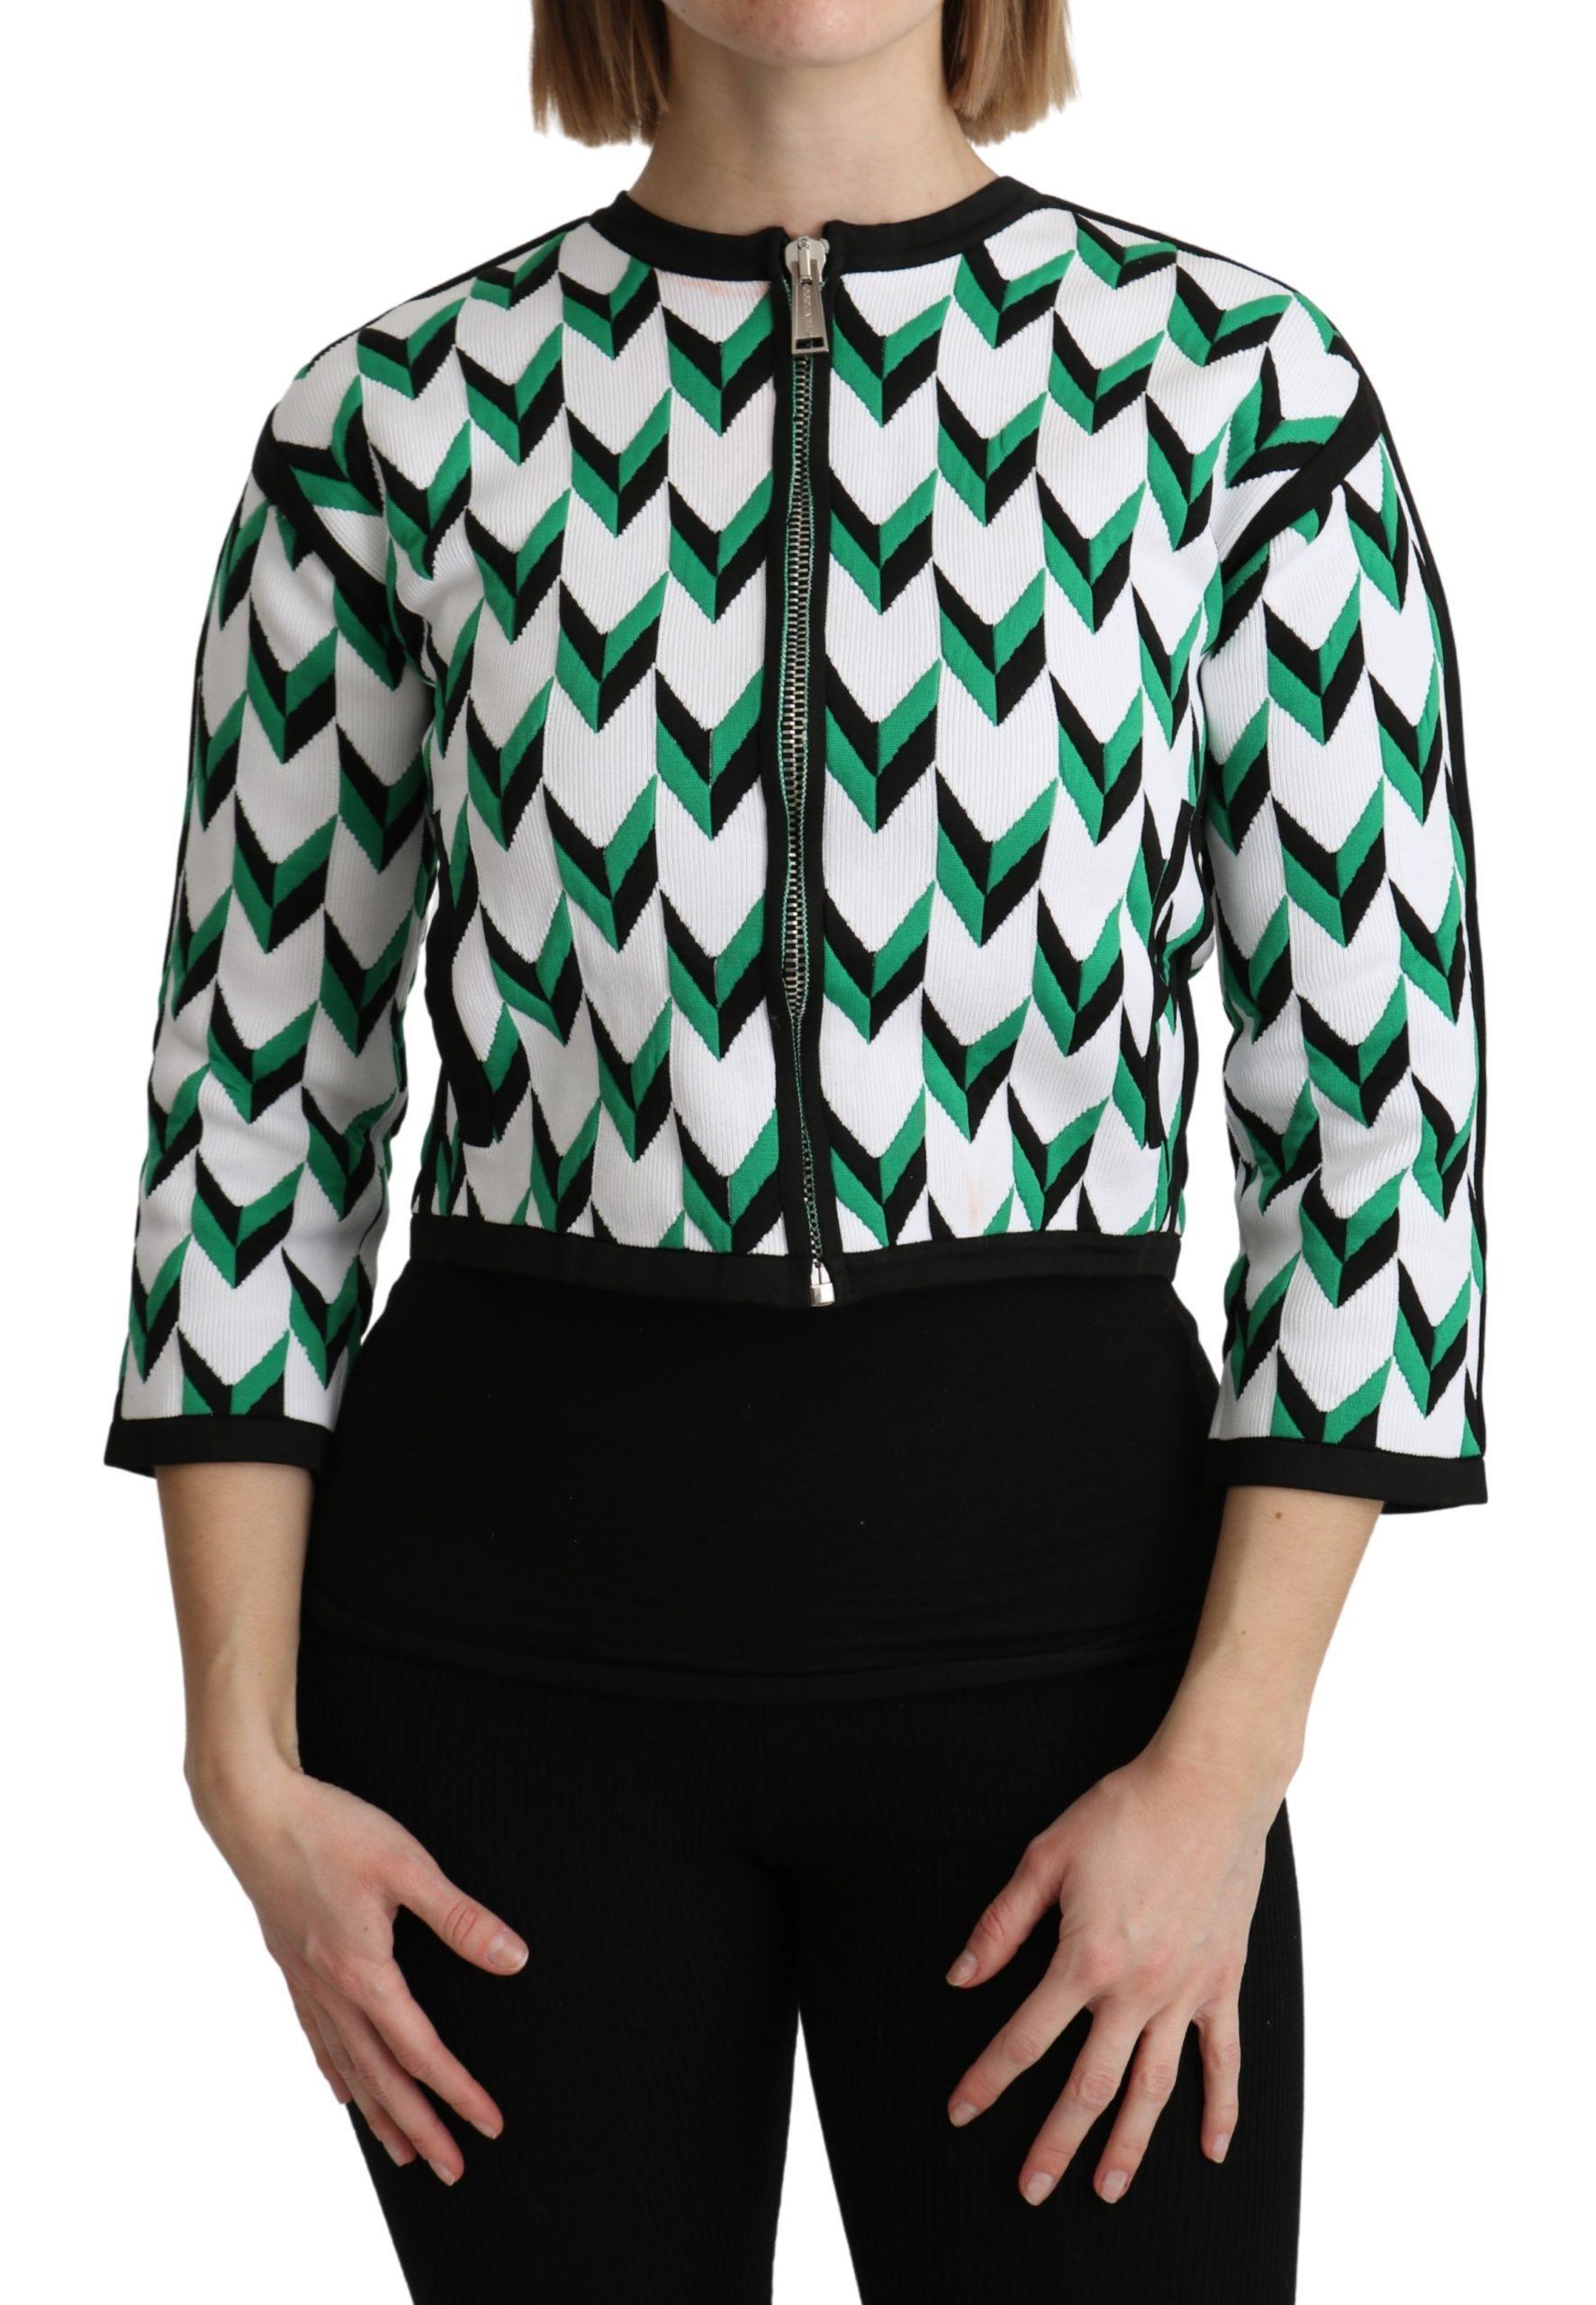 Dsquared² Women's Sleeve Cotton Full Zipper Sweater Black/White TSH5187 - XS